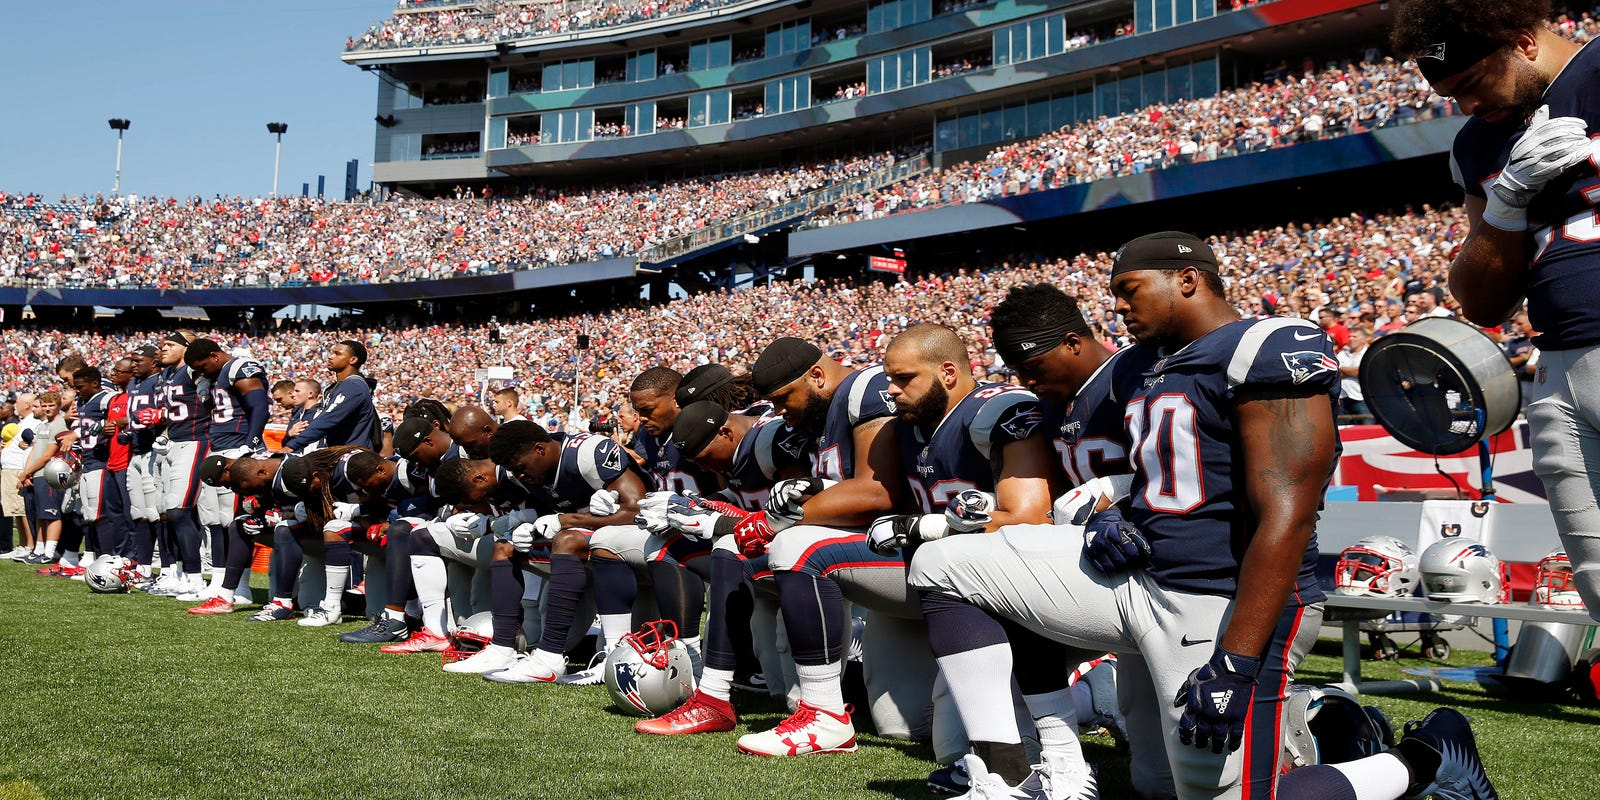 Trump's war with NFL protesters, GOP health bill doomed, Puerto